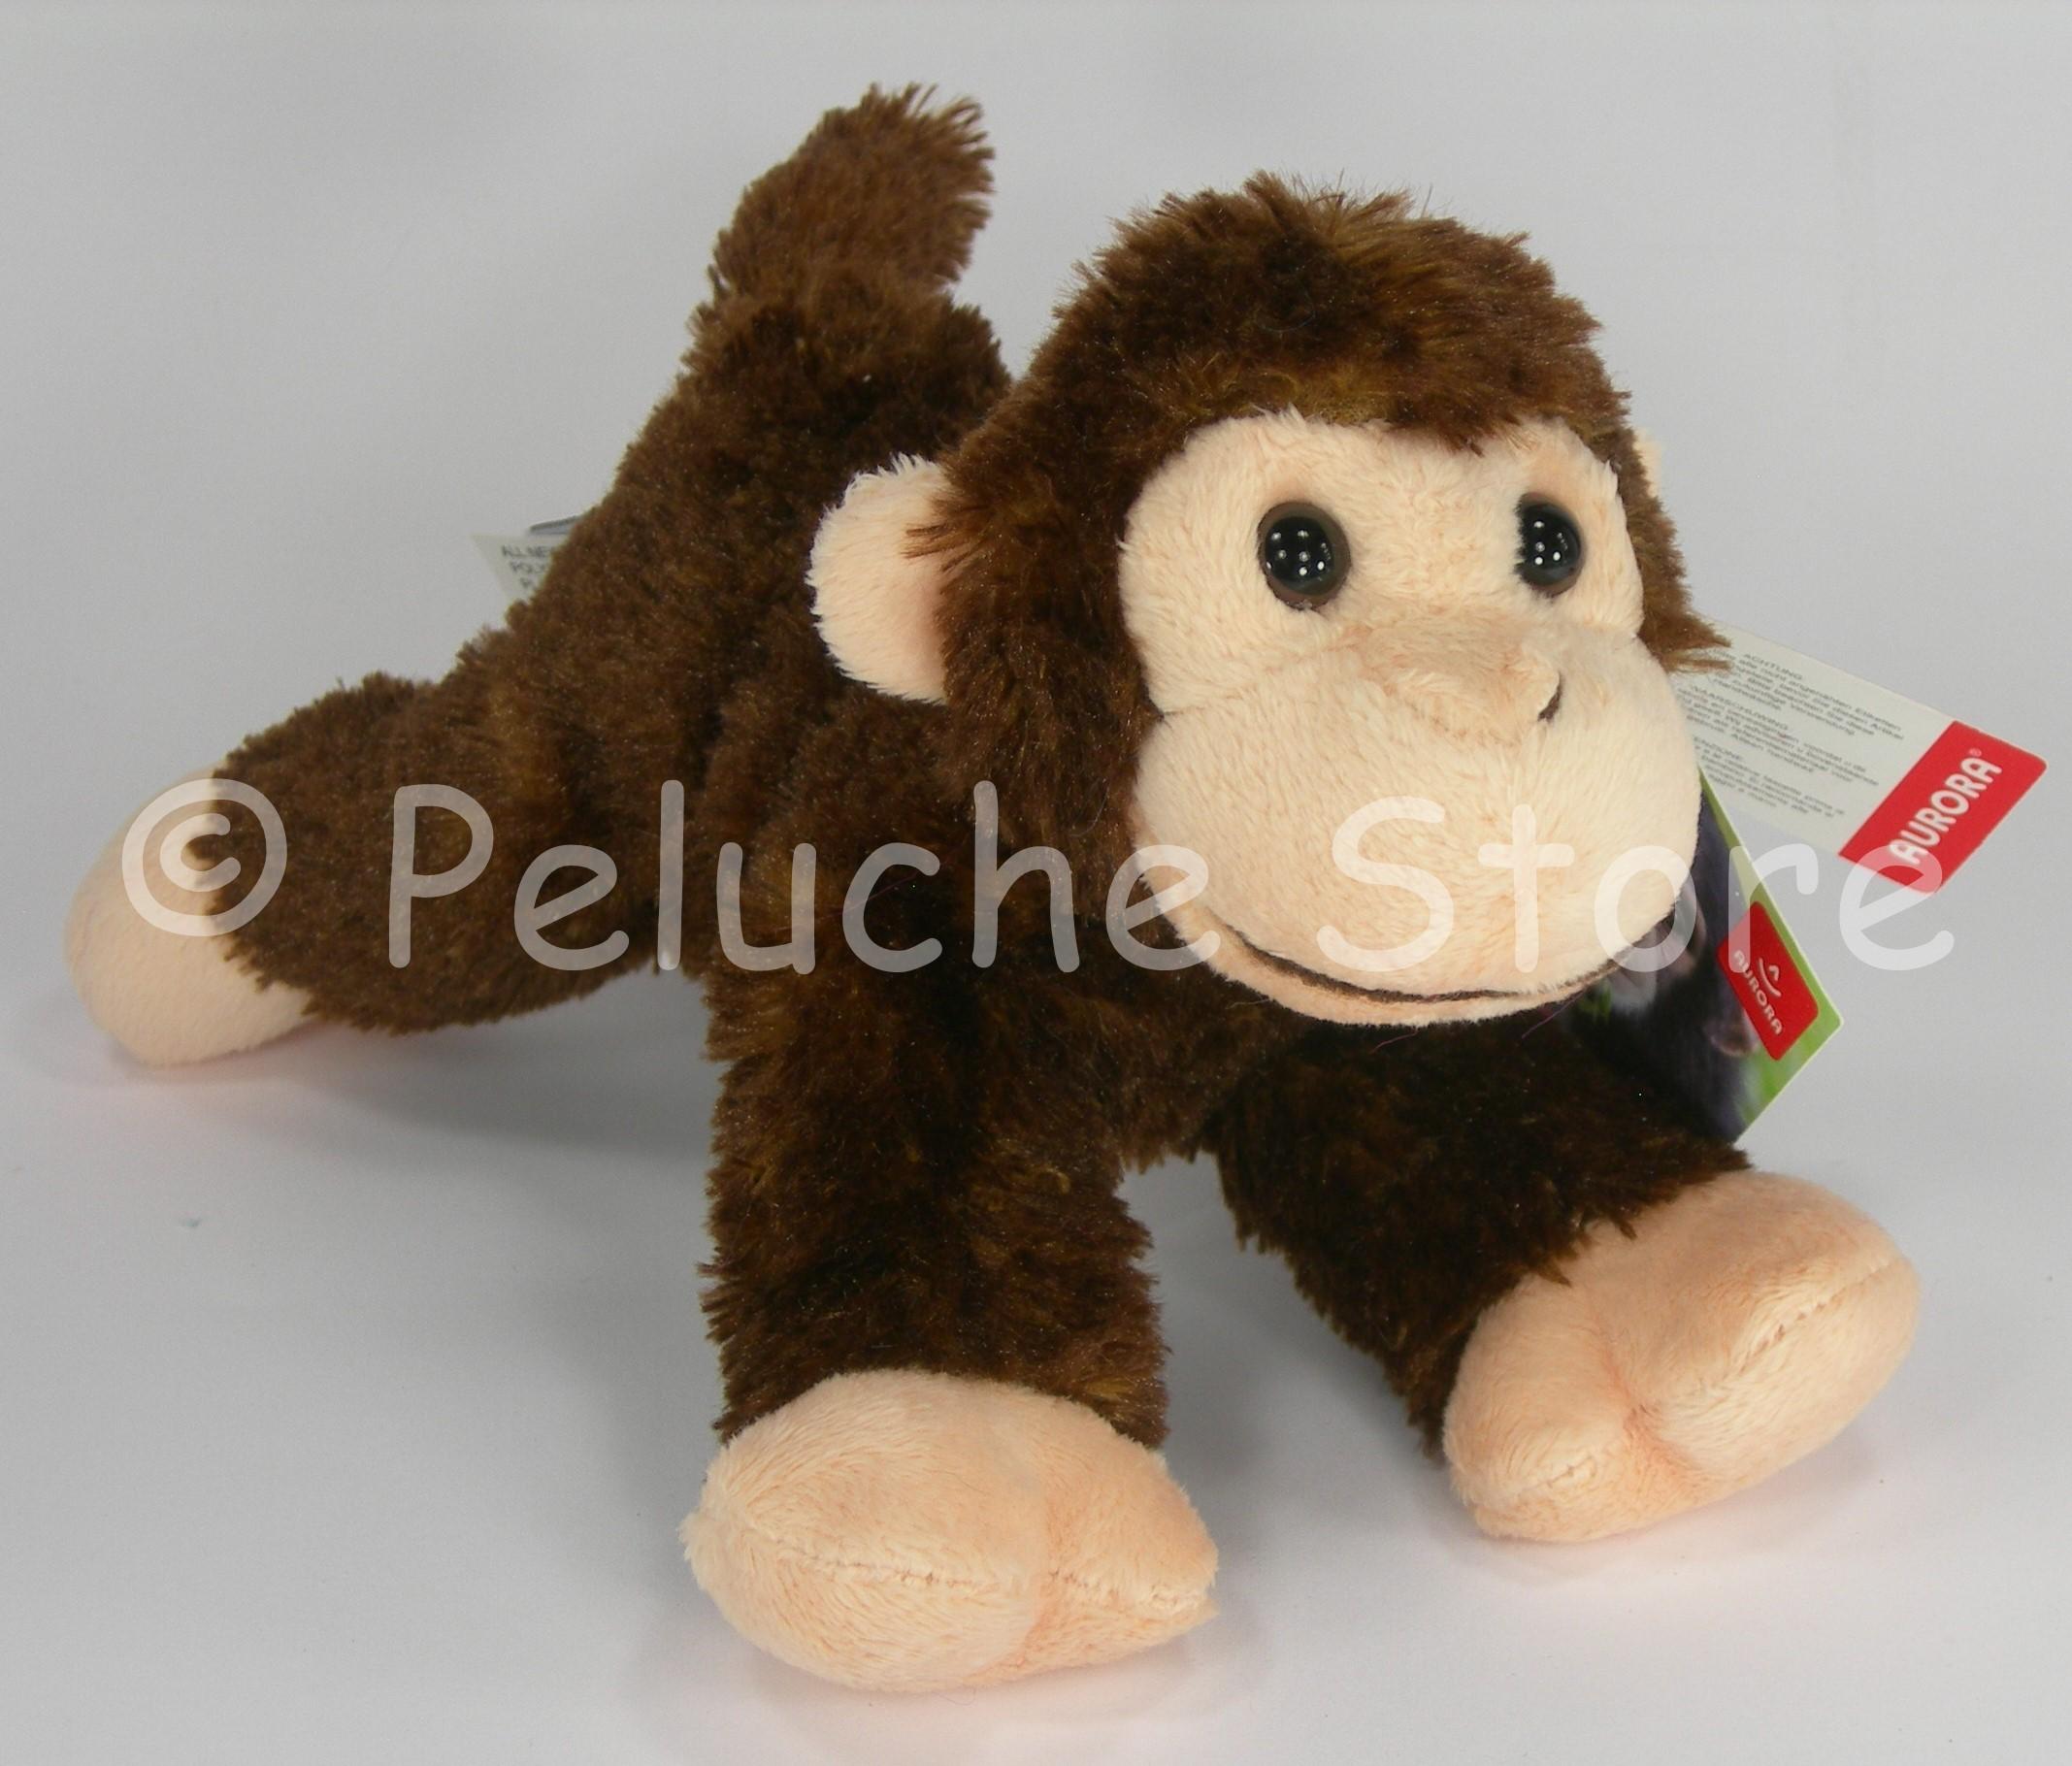 Aurora Baby Scimmia peluche 20 cm qualità extra Originale